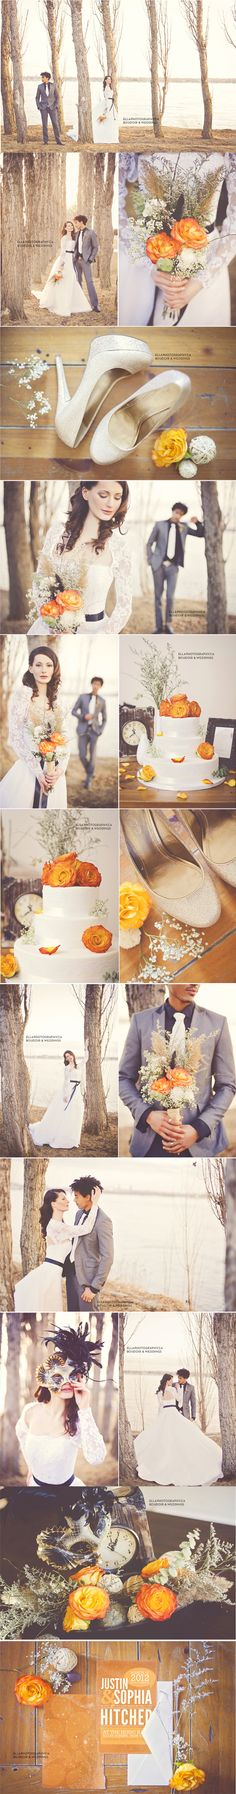 ADD diy <3 www.customweddingprintables.com <3 ...Tangerine wedding I love those flowers whatever they are!